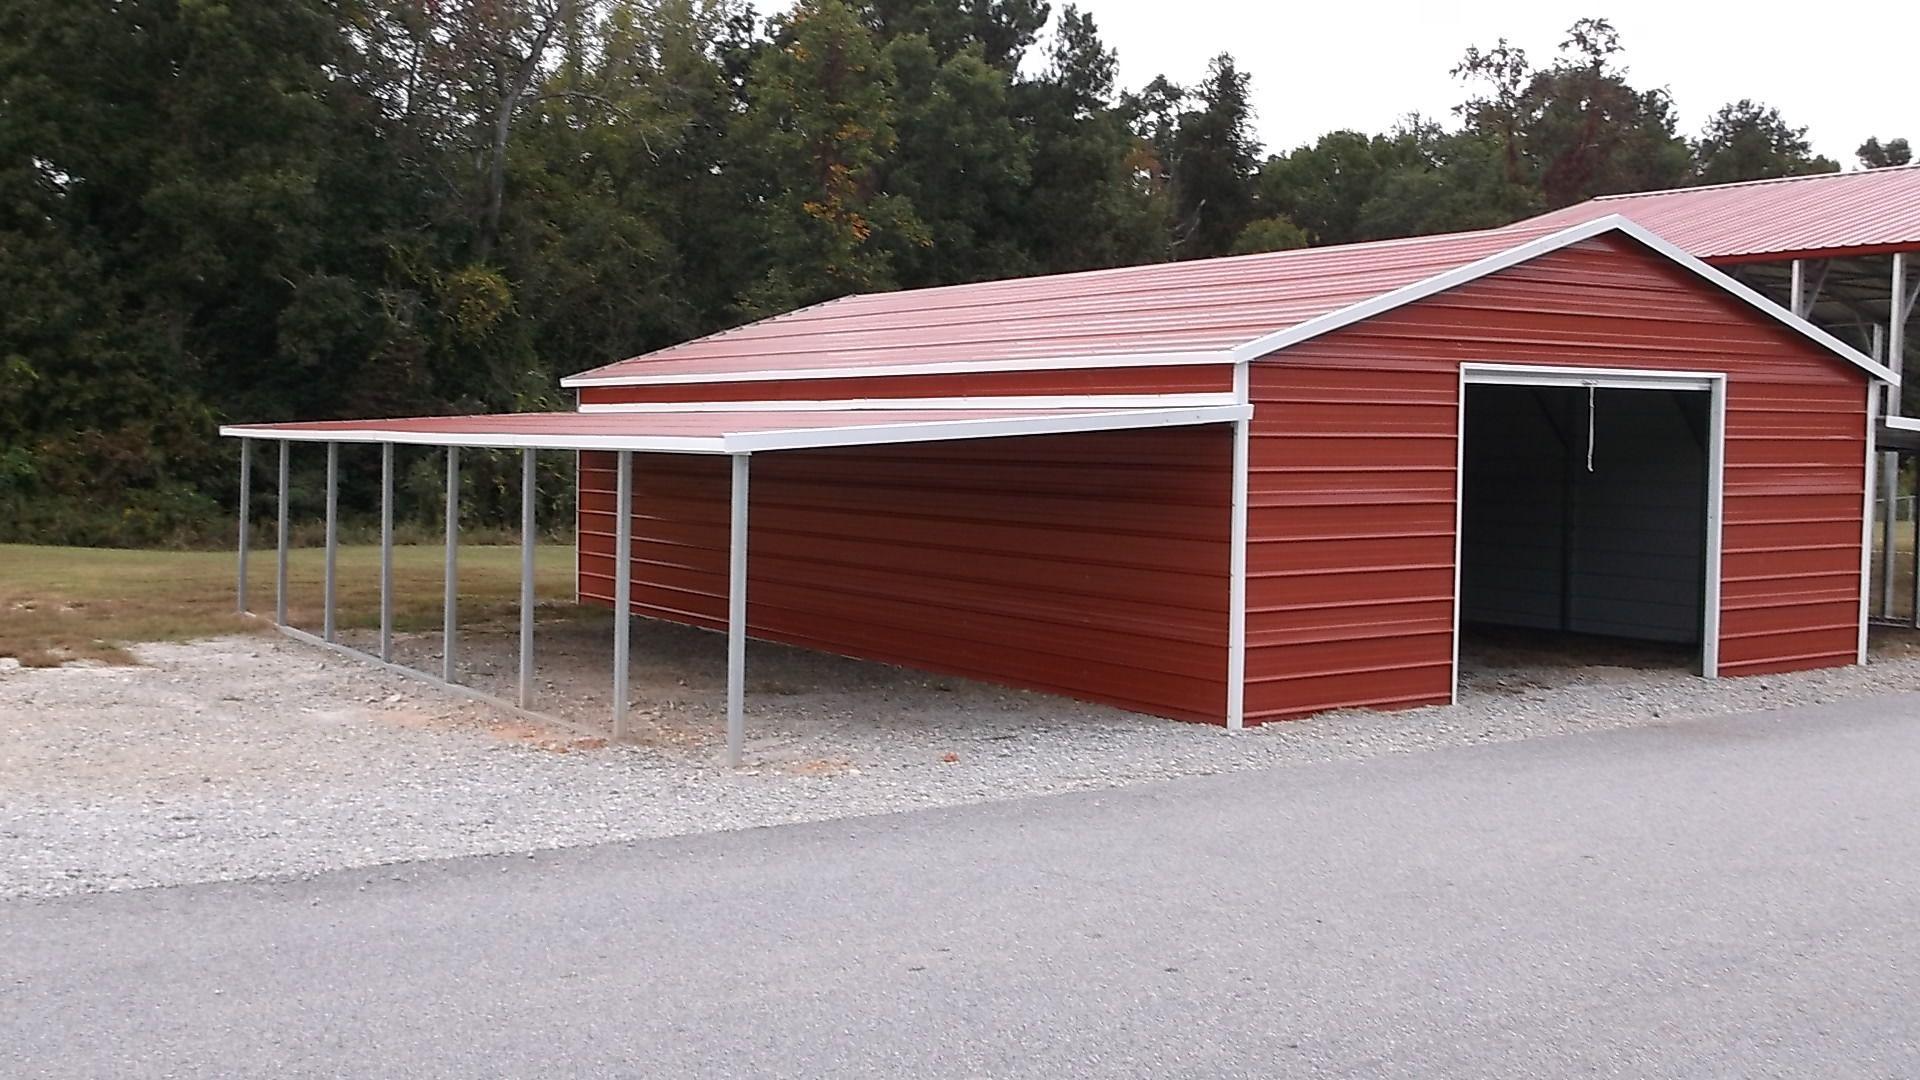 how can i customize my metal garage?, , choice metal buildings